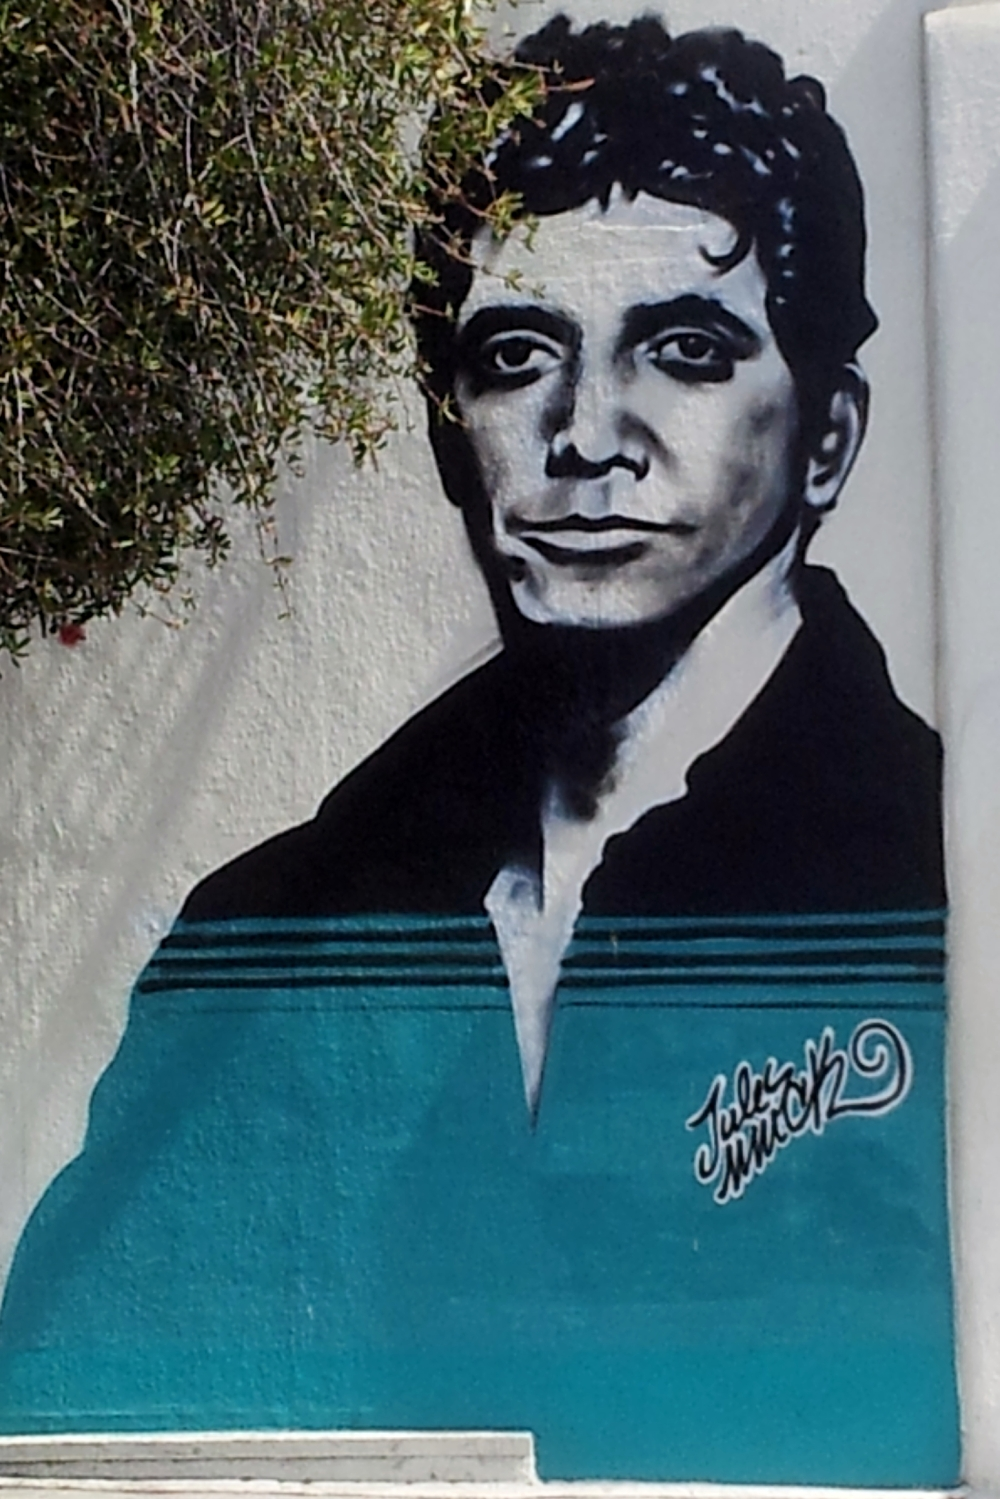 mural of Lou Reed